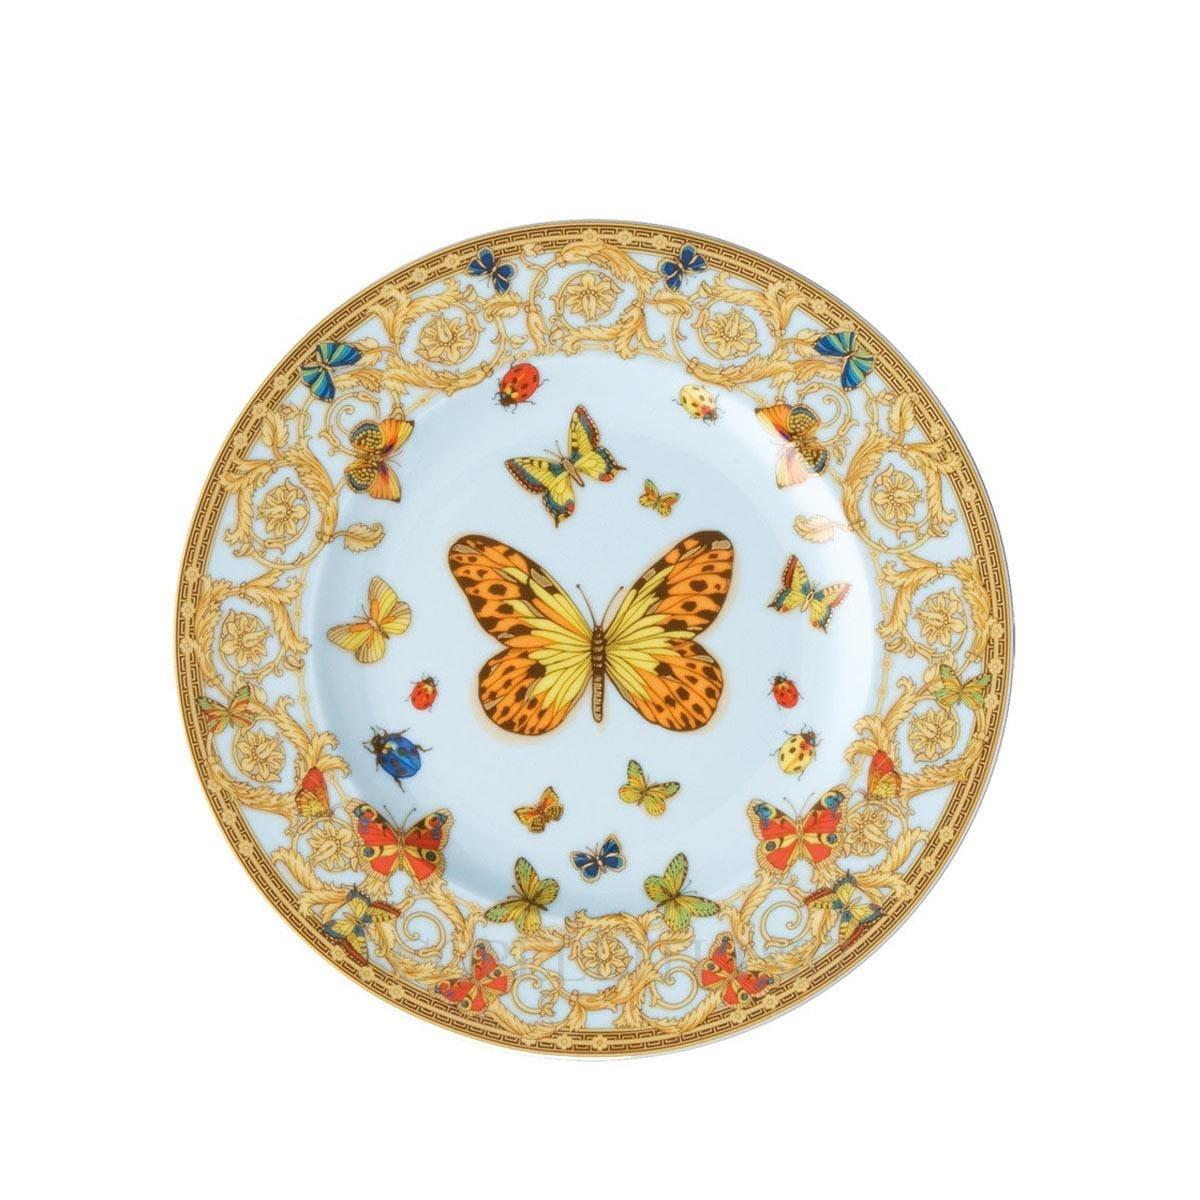 VersaceLe Jardin de Versace small plate 18 cm by Rosenthal